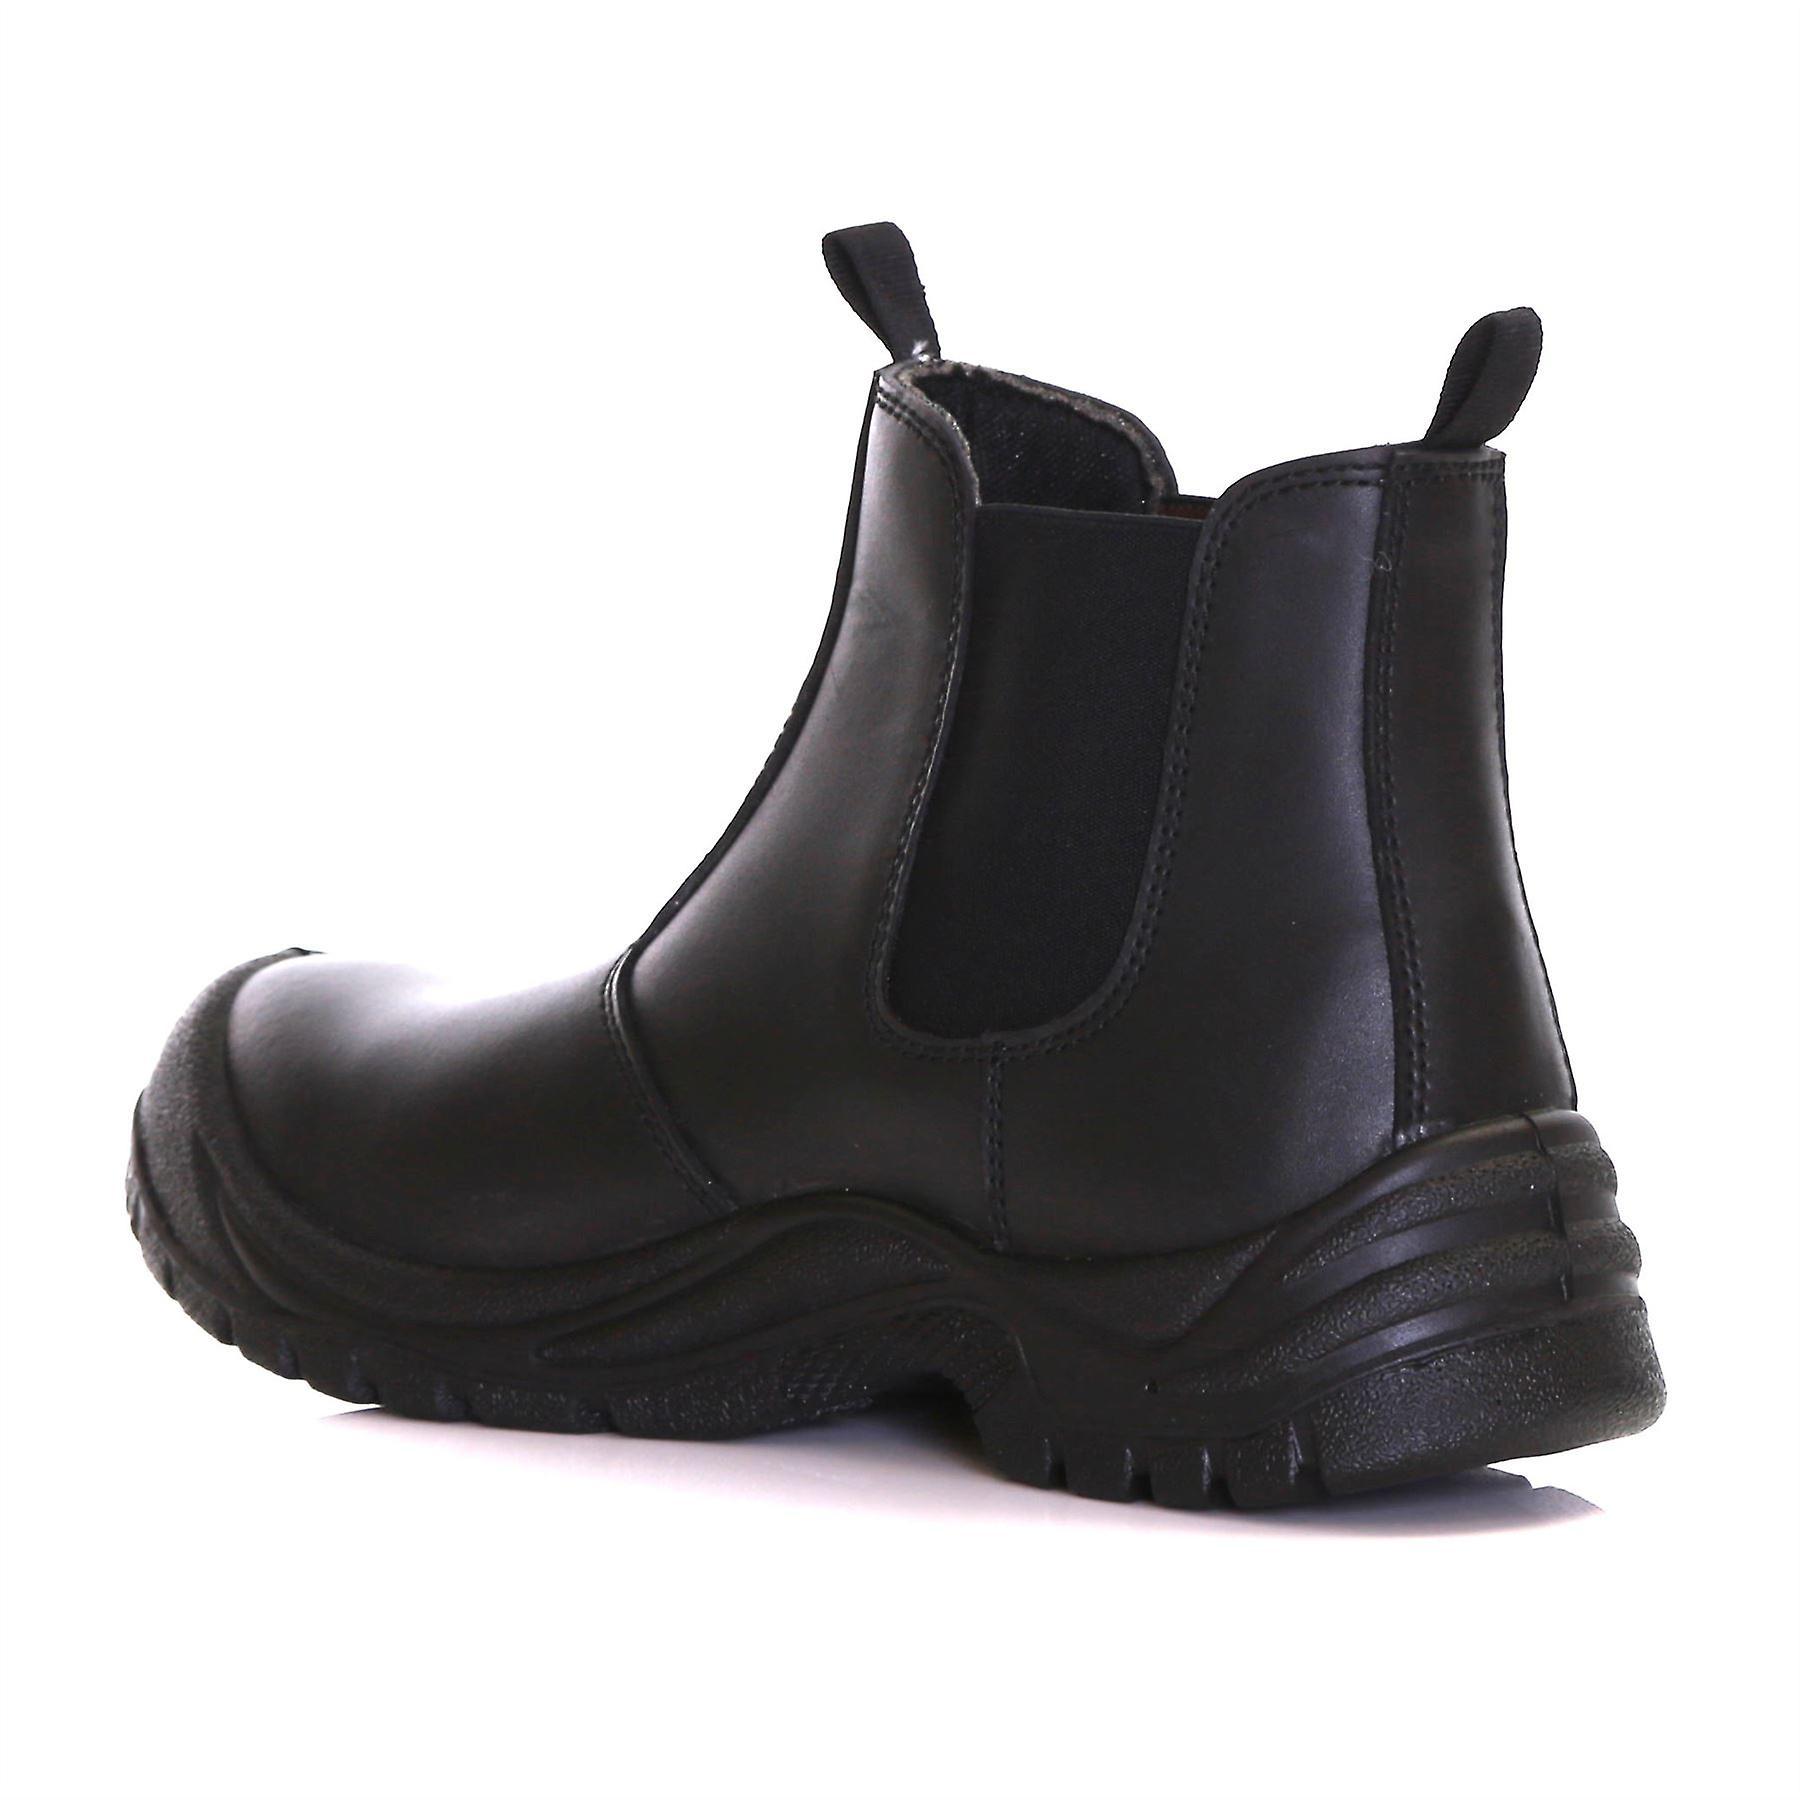 Slimbridge Goslar Size 12 Chelsea Safety Boots, Black